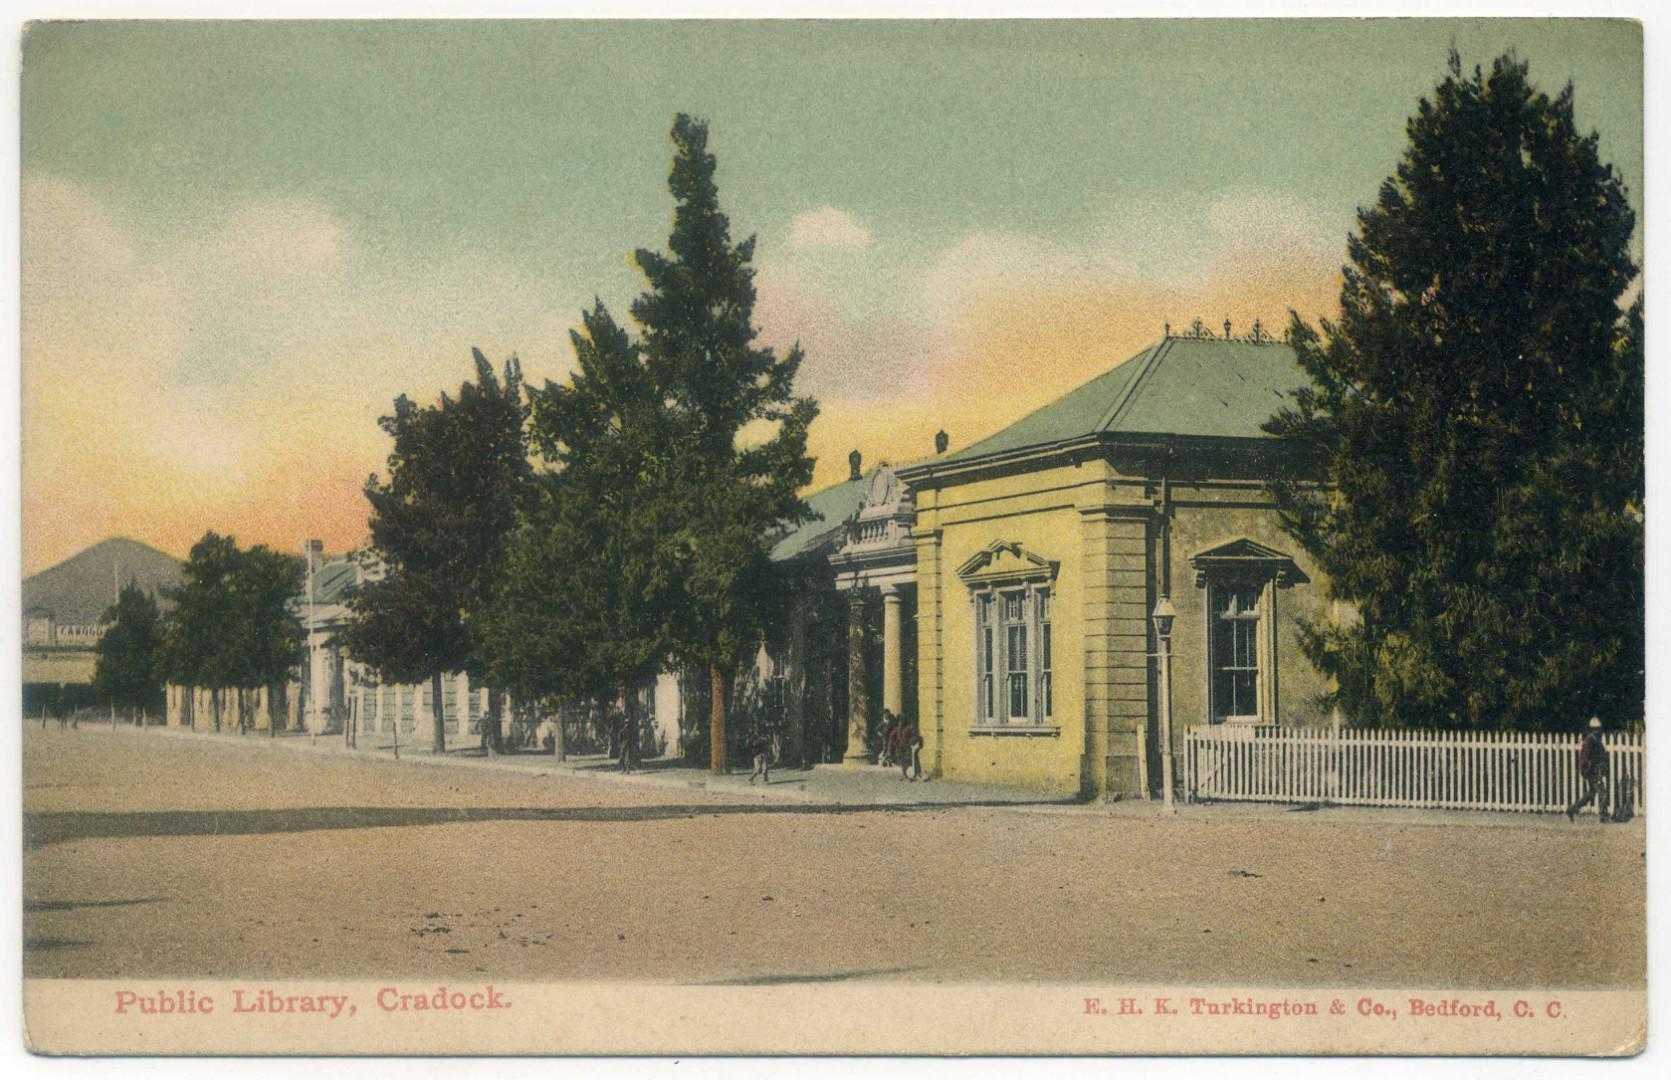 South Africa Cradock Public Library